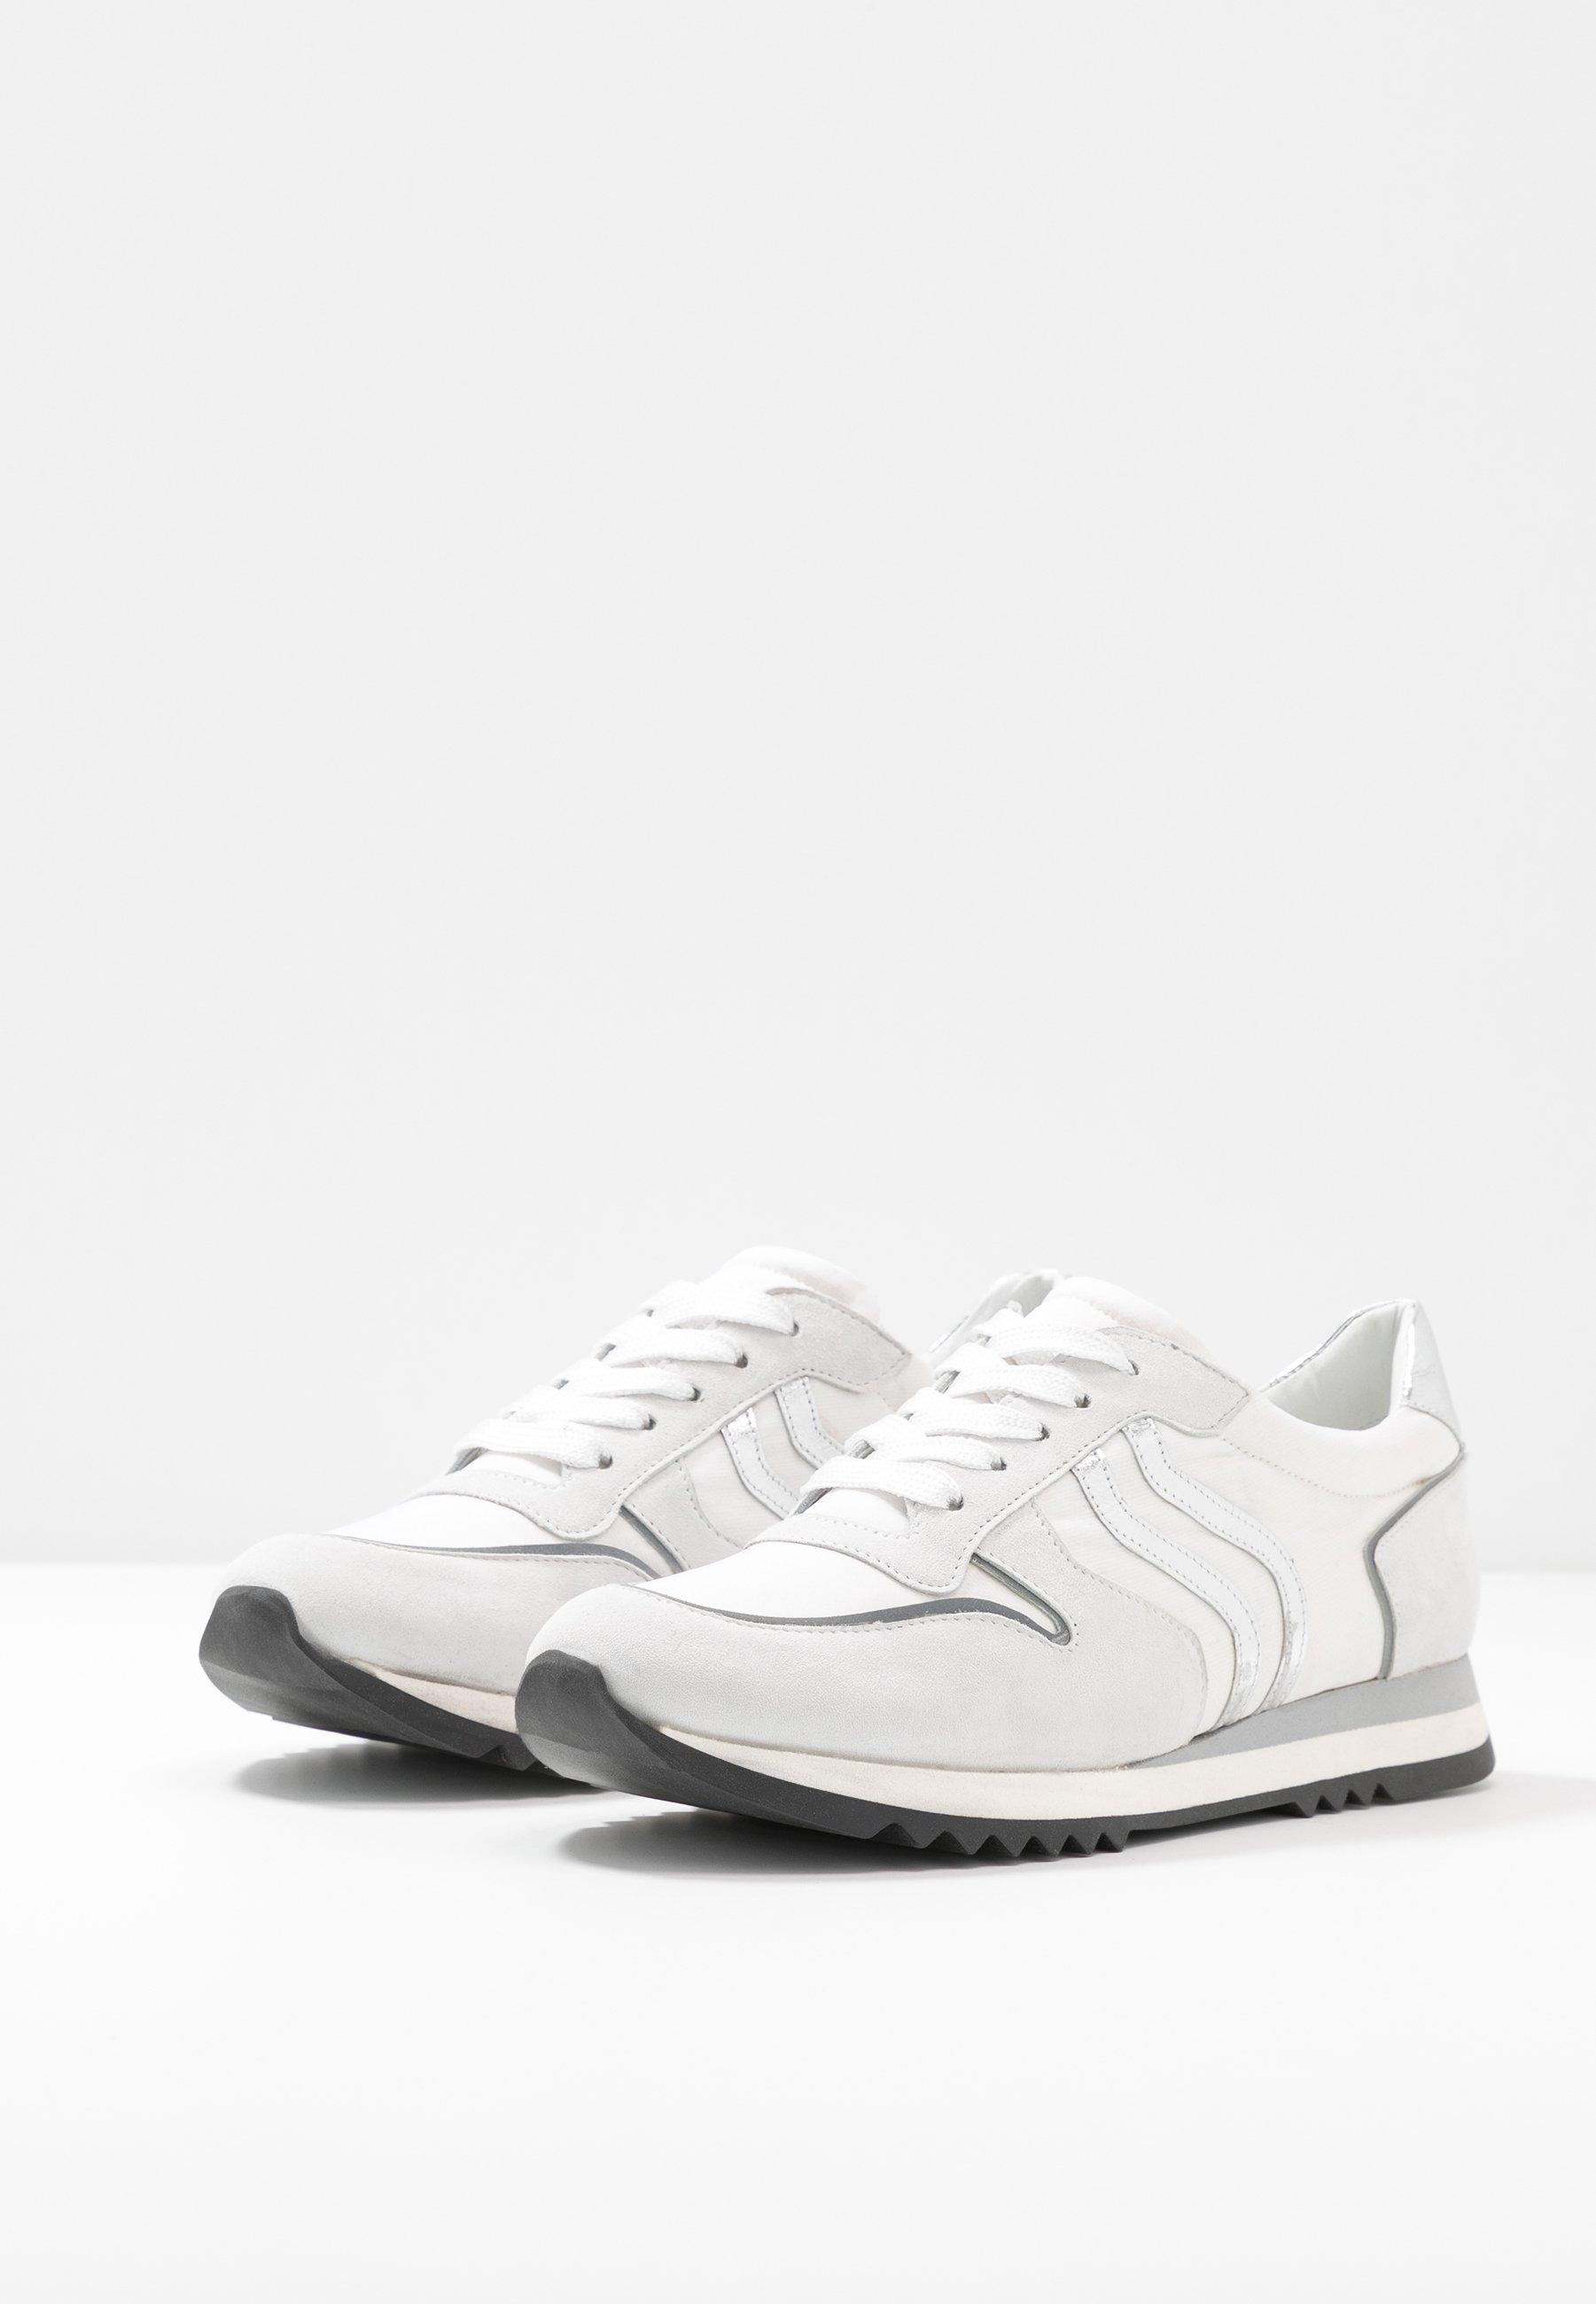 Maripé Sneakers - ghiaccio/limon